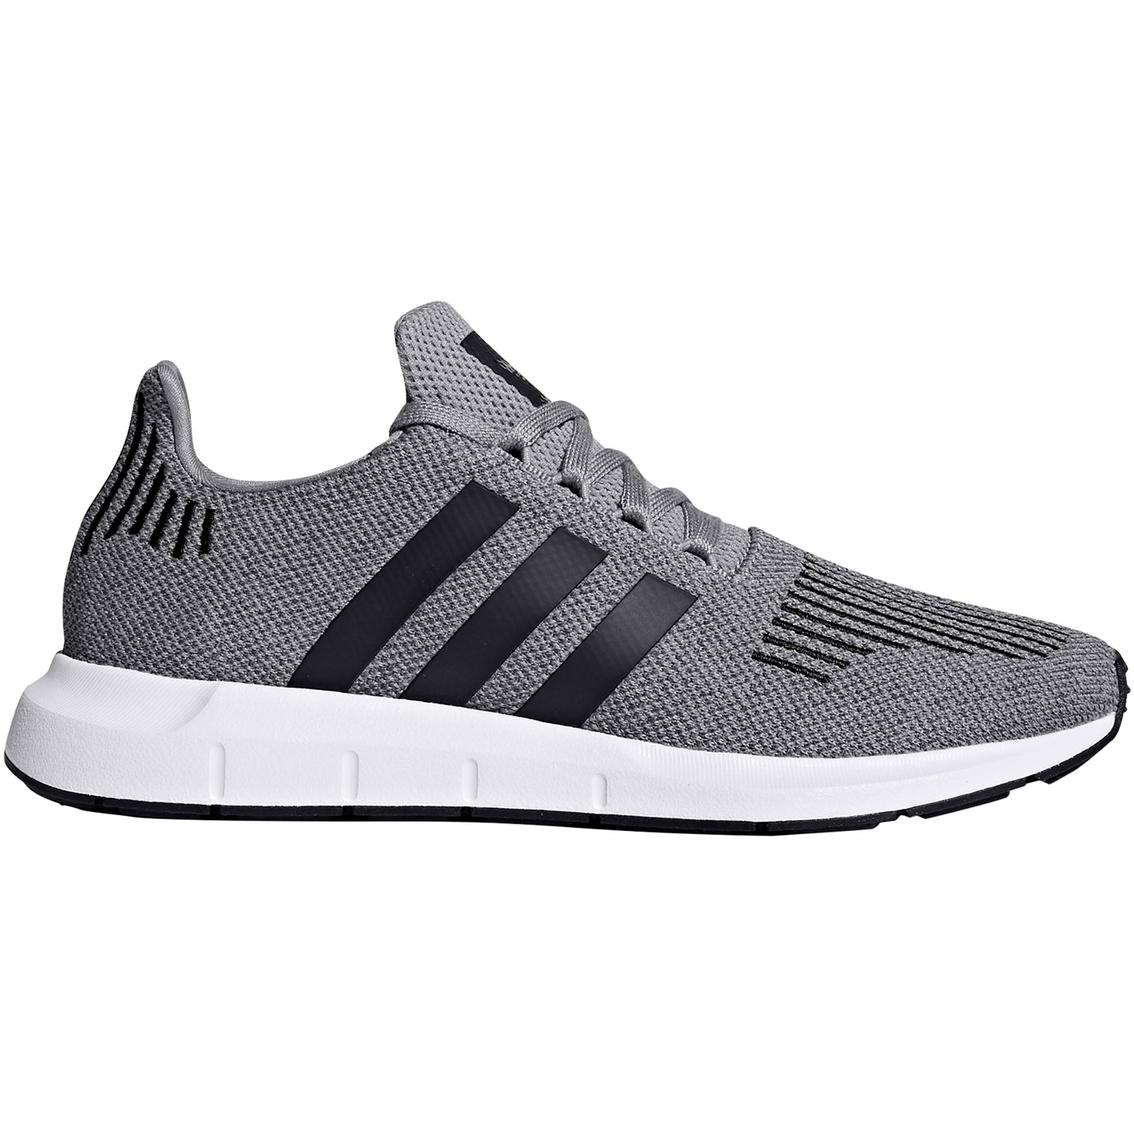 Adidas Men's Swift Run Shoes | Running